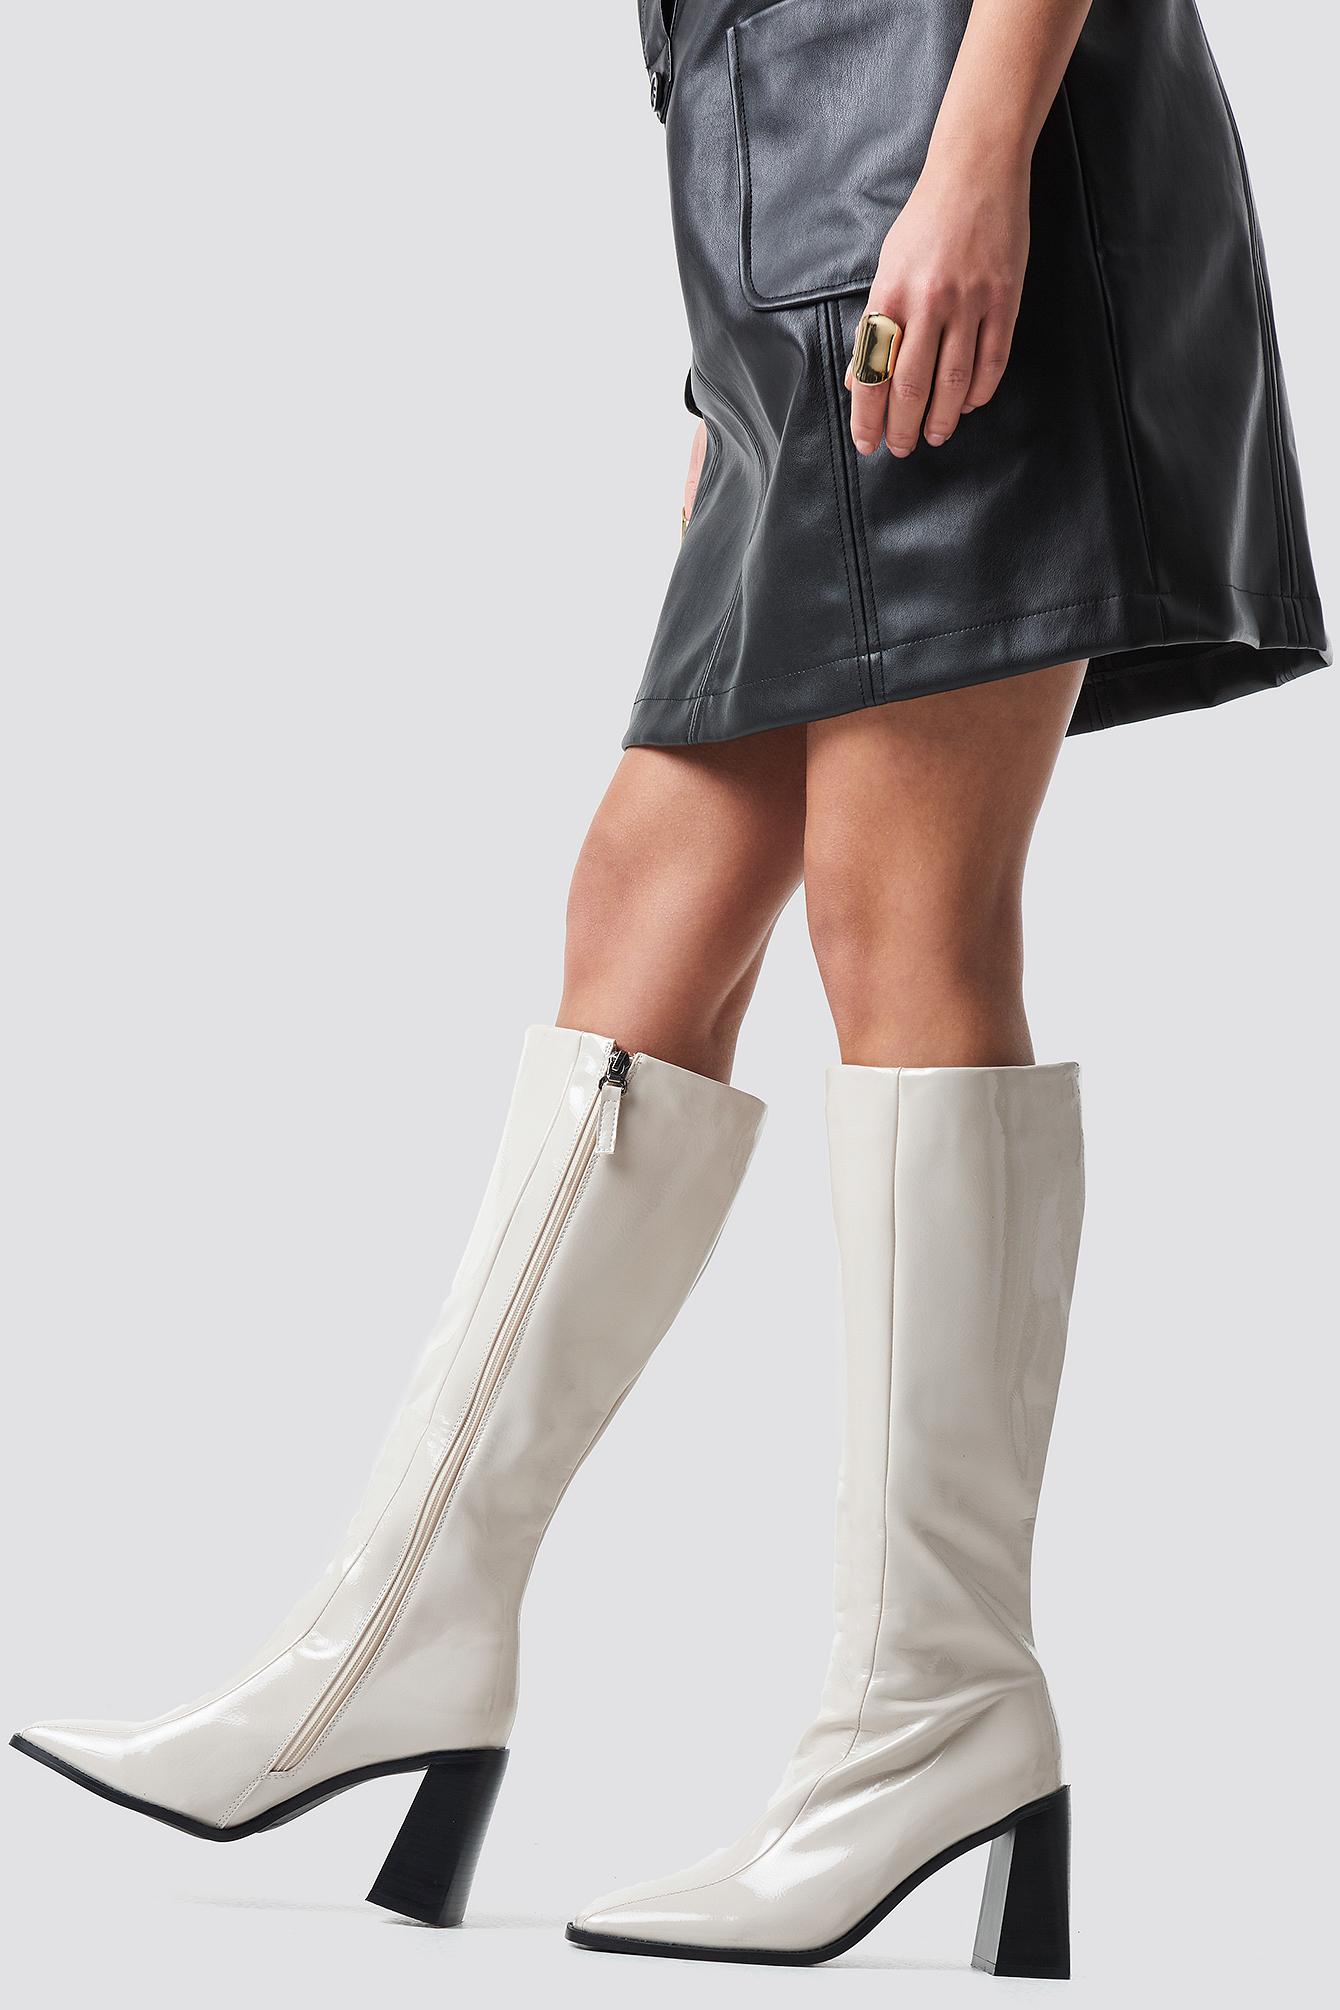 raid -  Lenore Long Boot - White